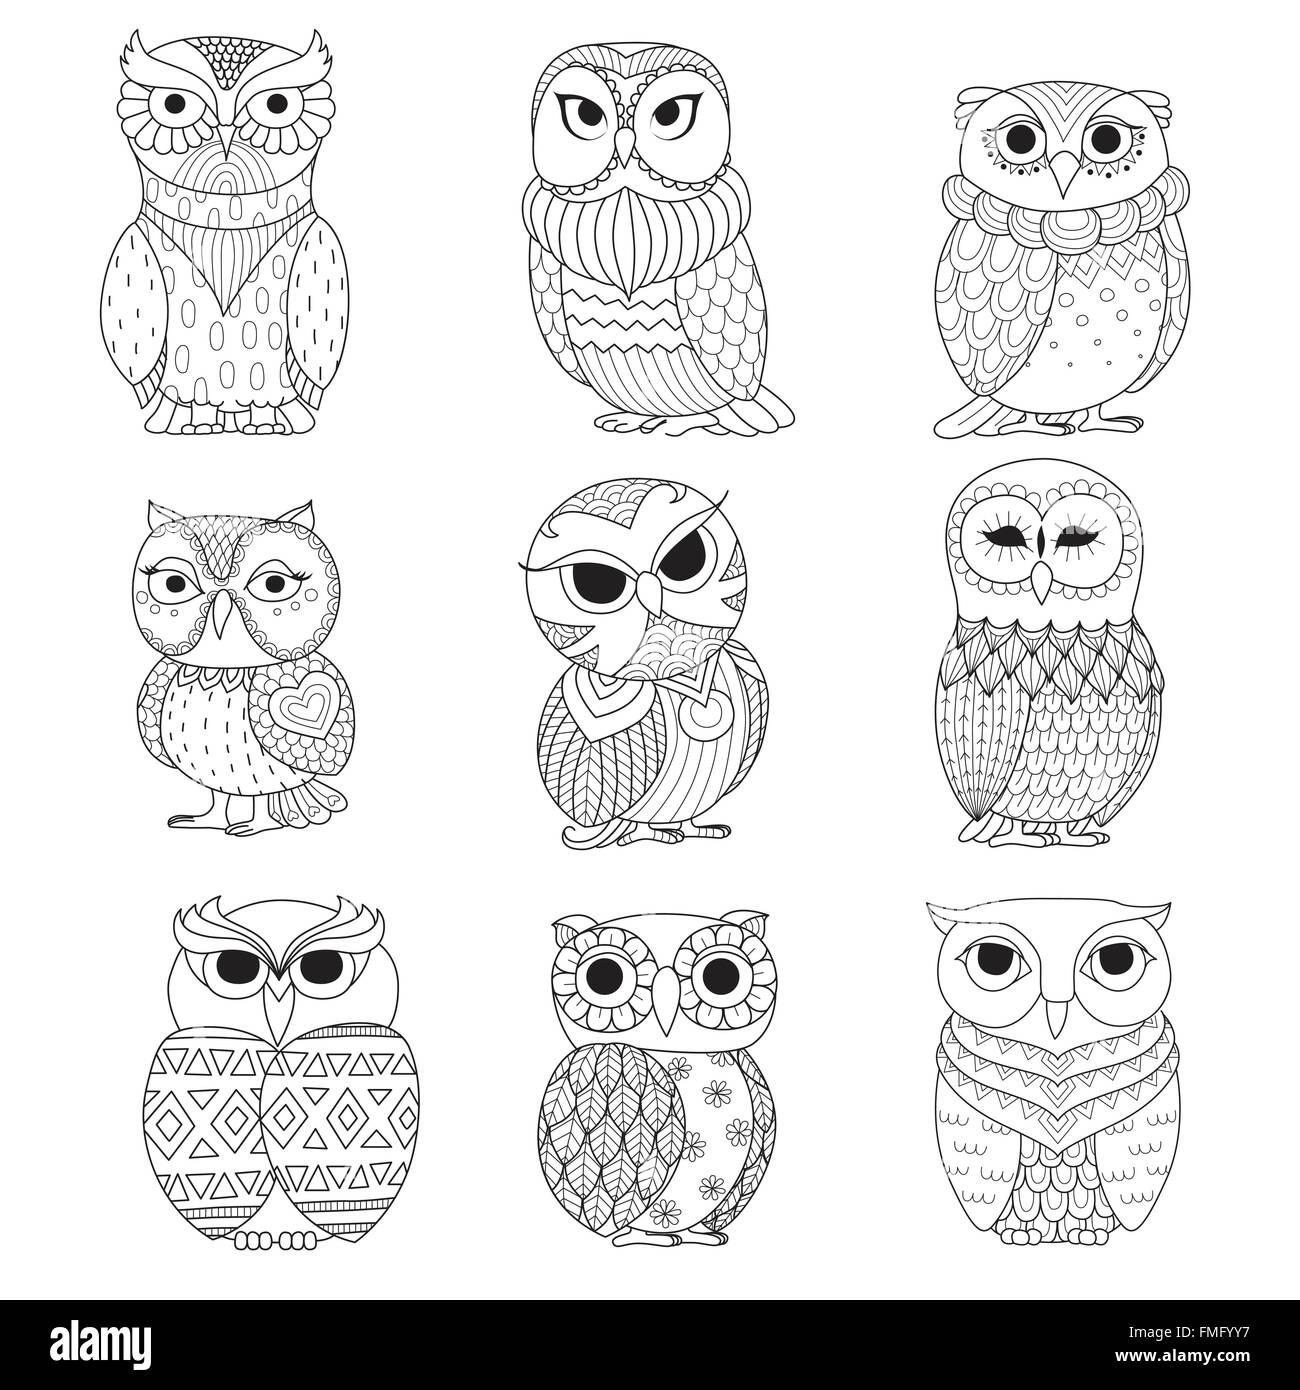 Shirt design book - Nine Owls Design For Coloring Book Tattoo Shirt Design And Other Decoration